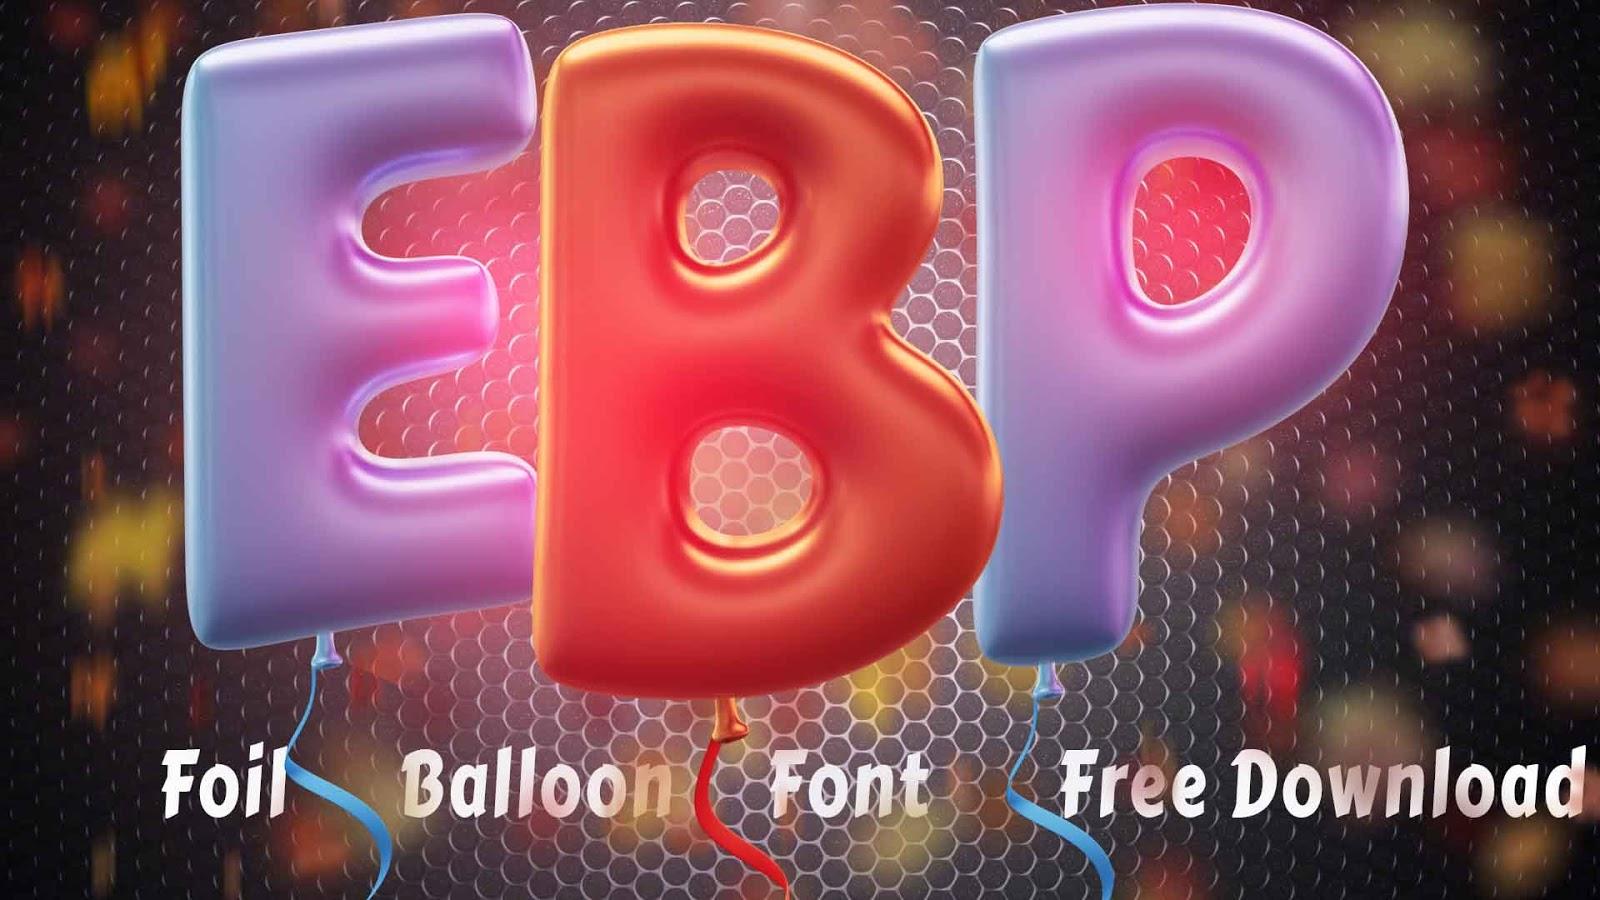 Free Foil Balloon 3D Lettering - Foil Balloon Font Free Download